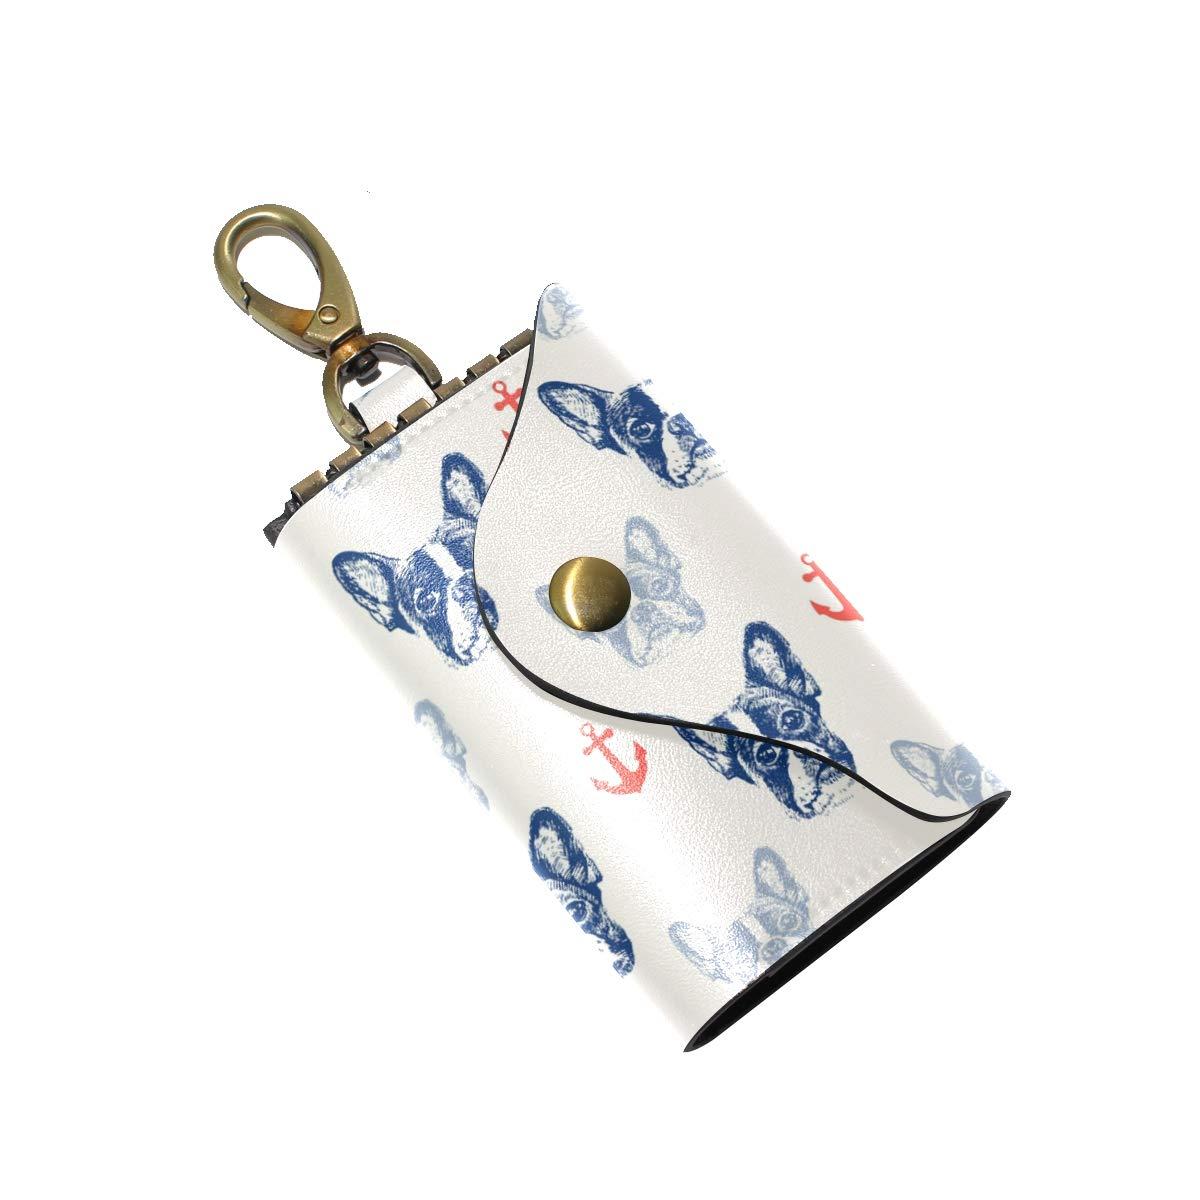 KEAKIA French Bulldog Pattern Leather Key Case Wallets Tri-fold Key Holder Keychains with 6 Hooks 2 Slot Snap Closure for Men Women